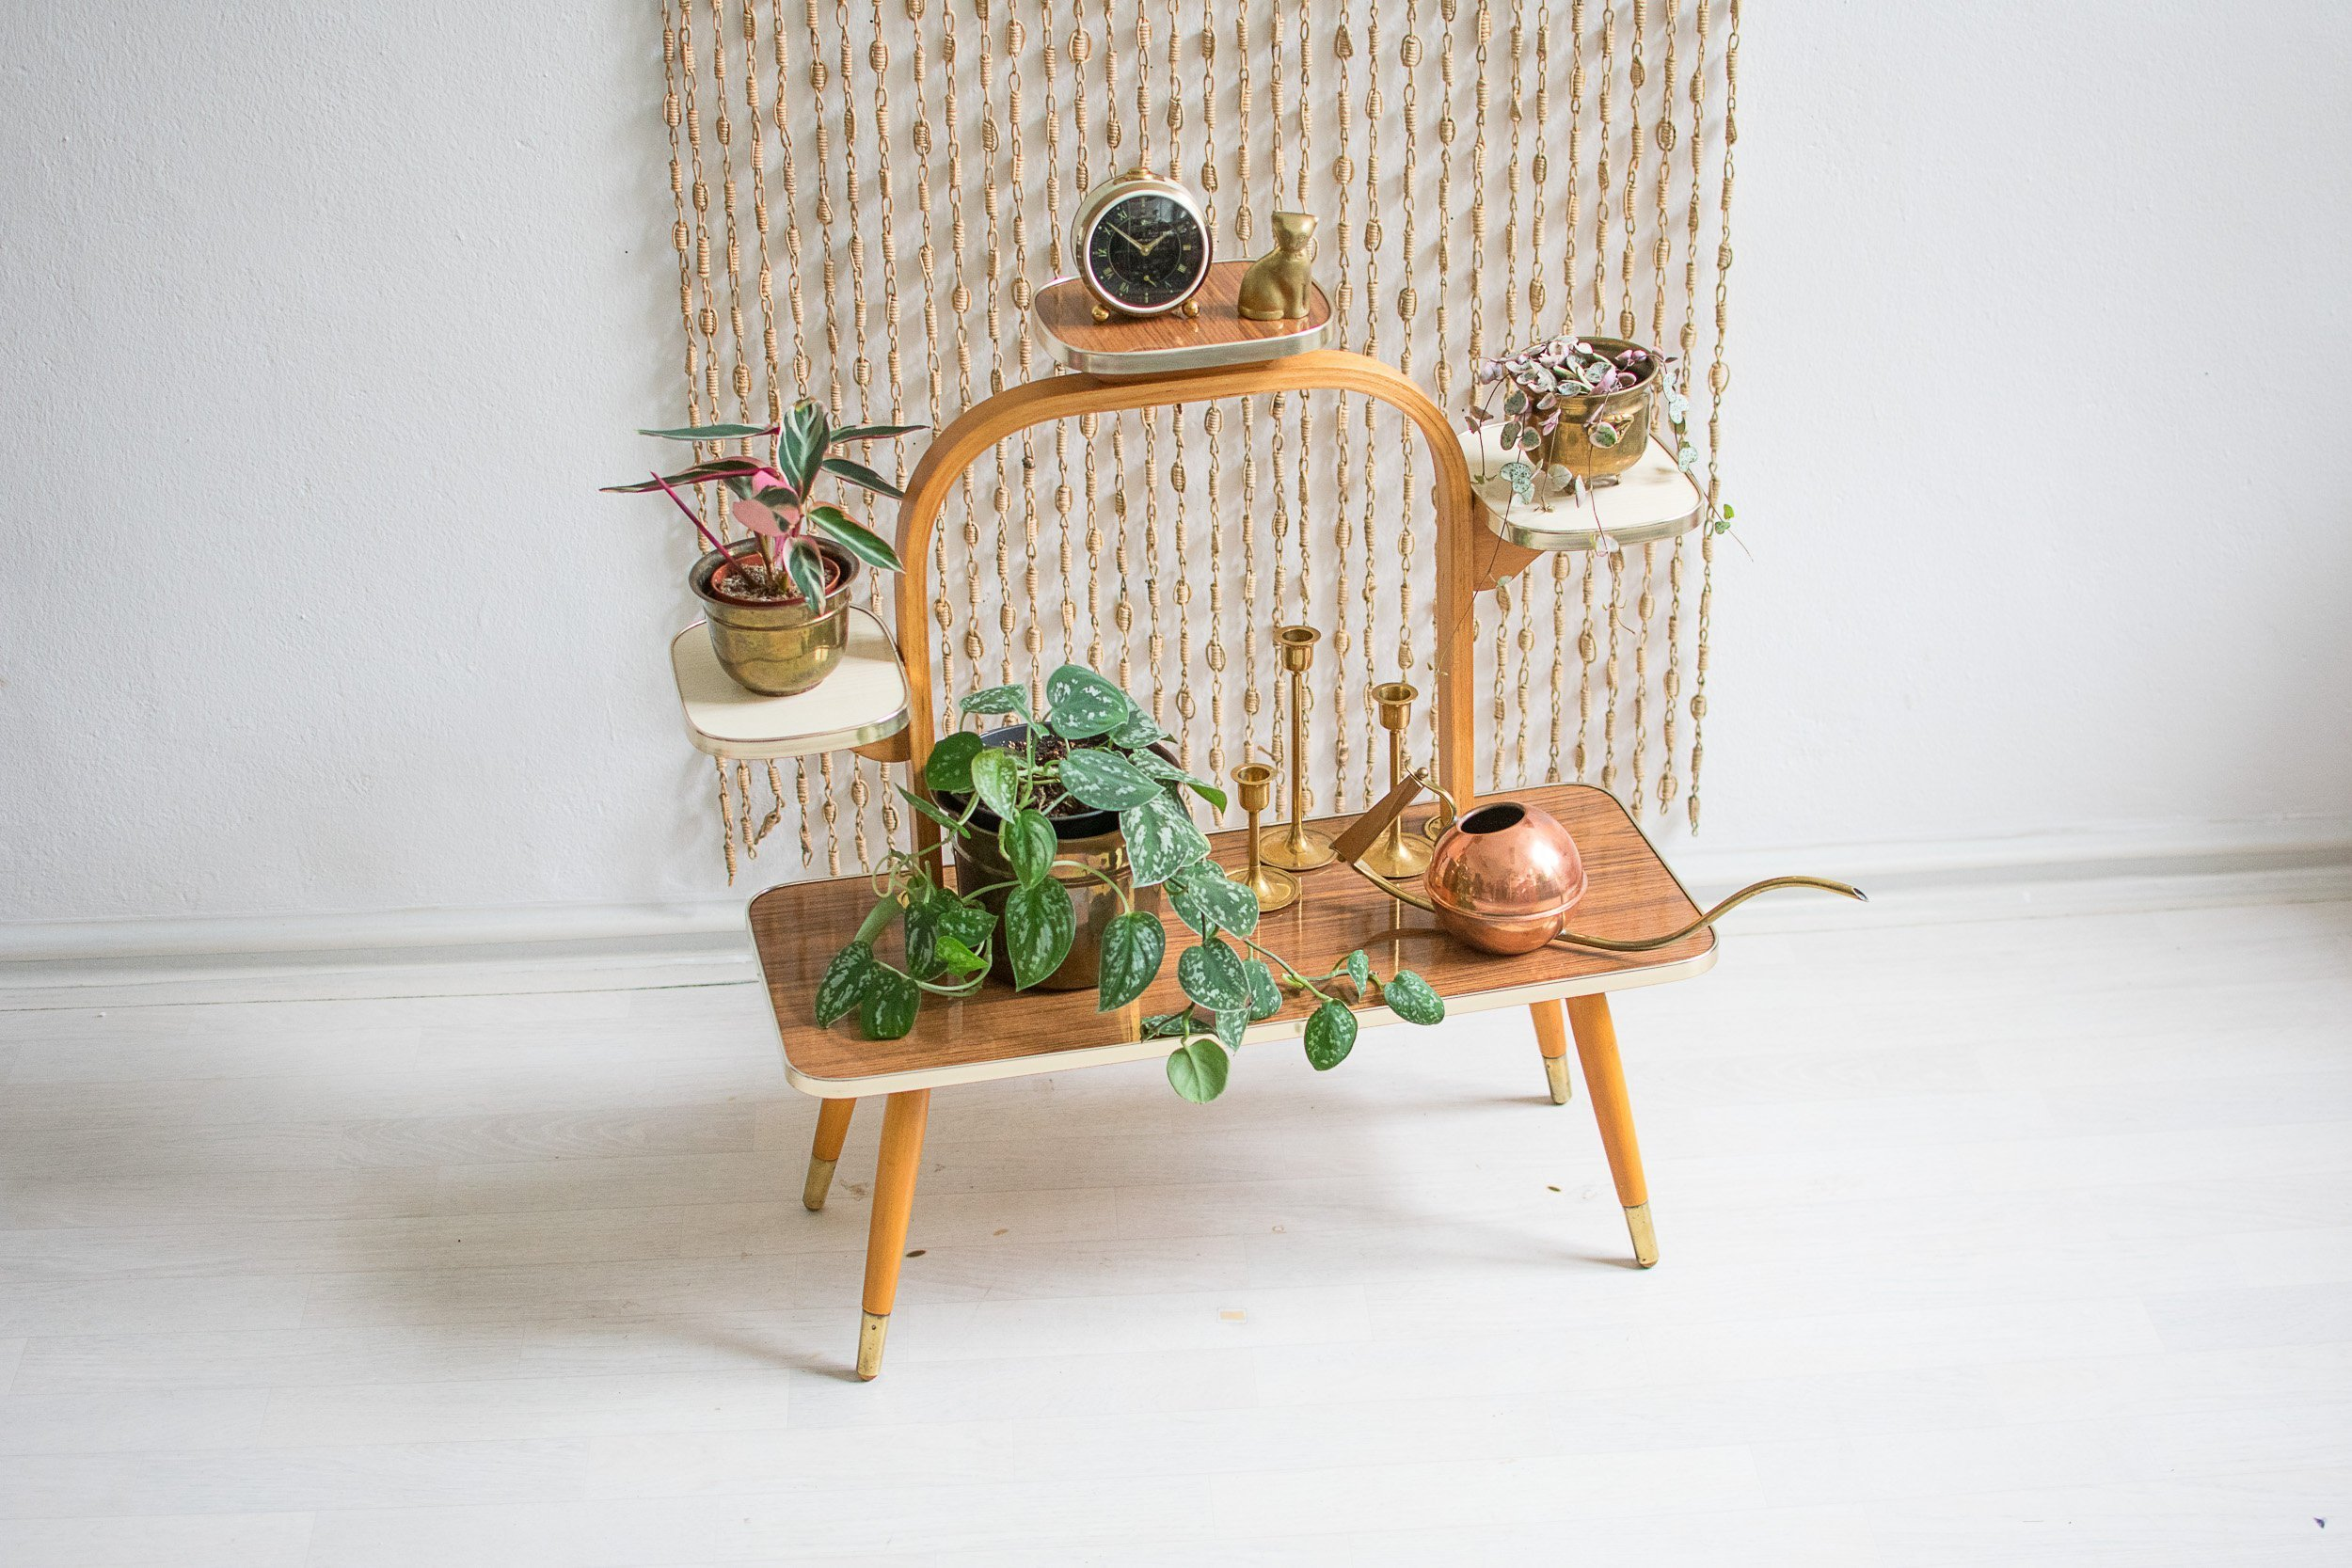 10 ways to style houseplants using vintage accessories | Vinterior